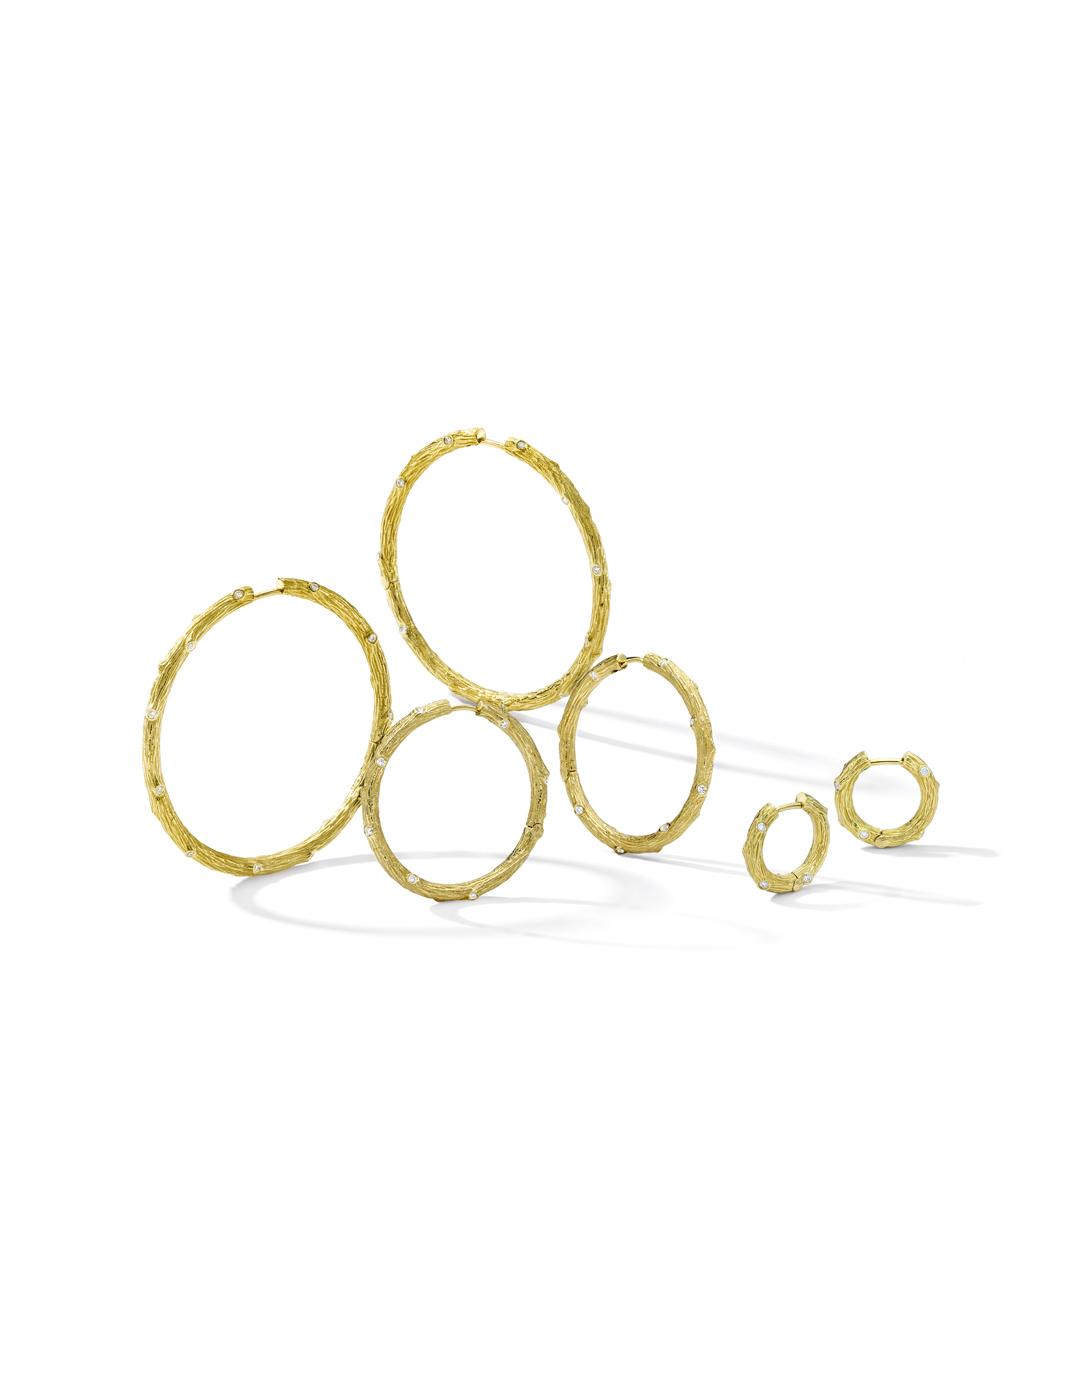 mish_products_earrings_Twig-Med Hoop YG-ER-Editorial-1